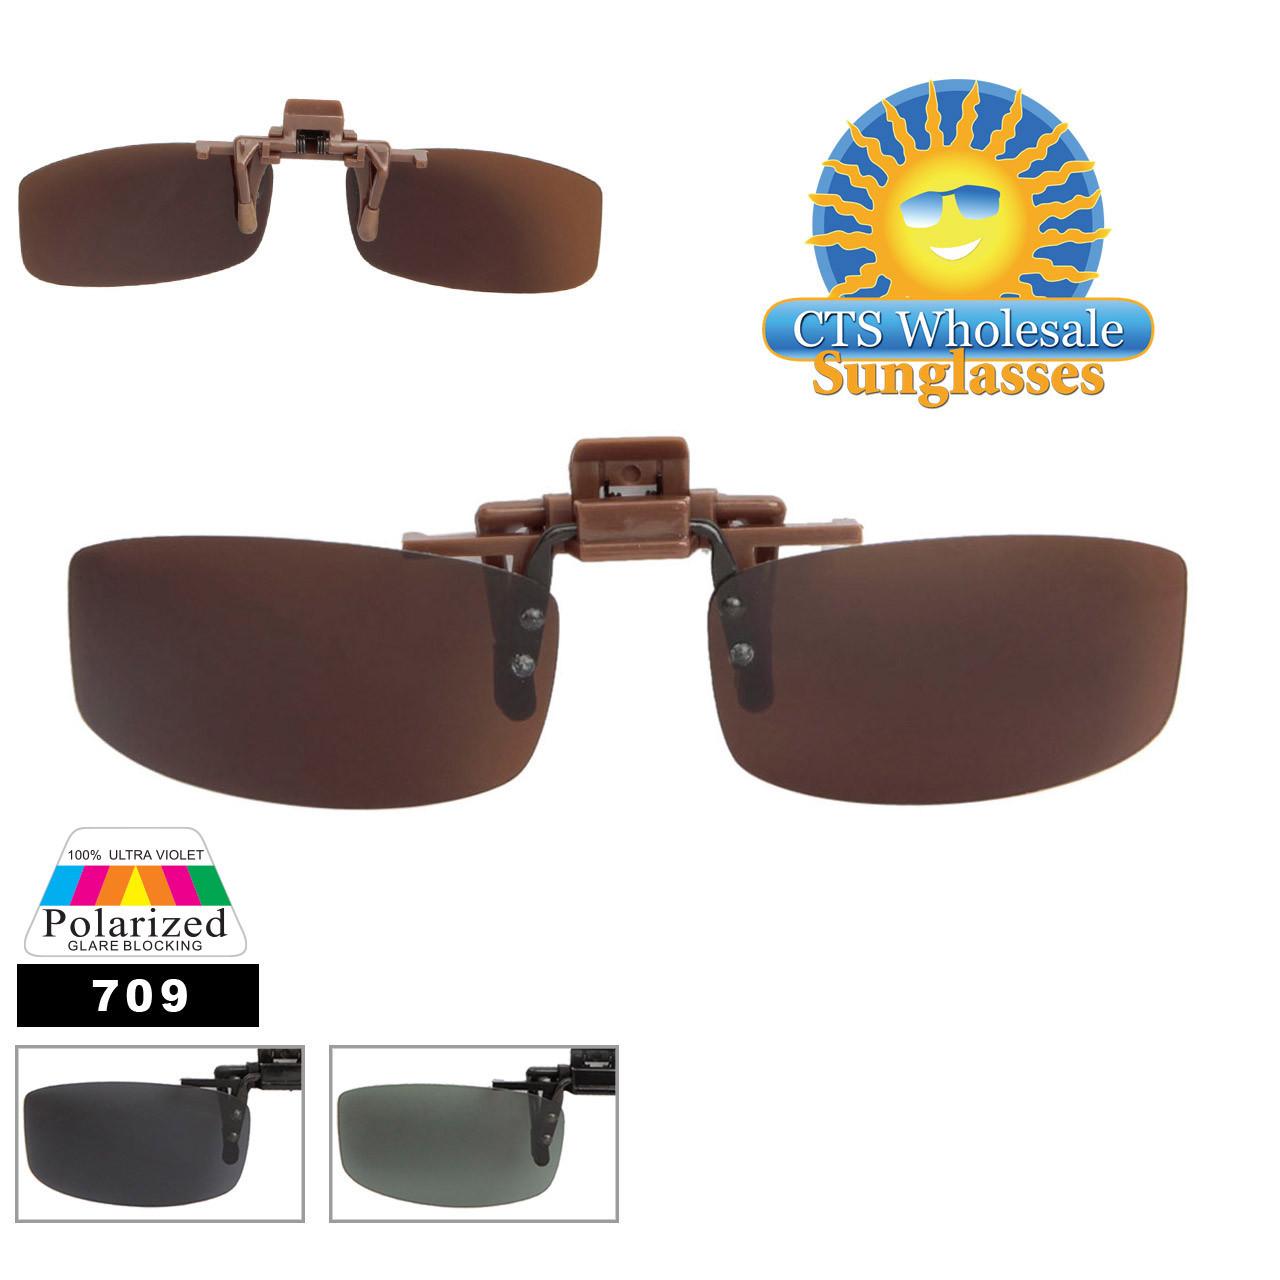 Wholesale Polarized Clip On Sunglasses 709